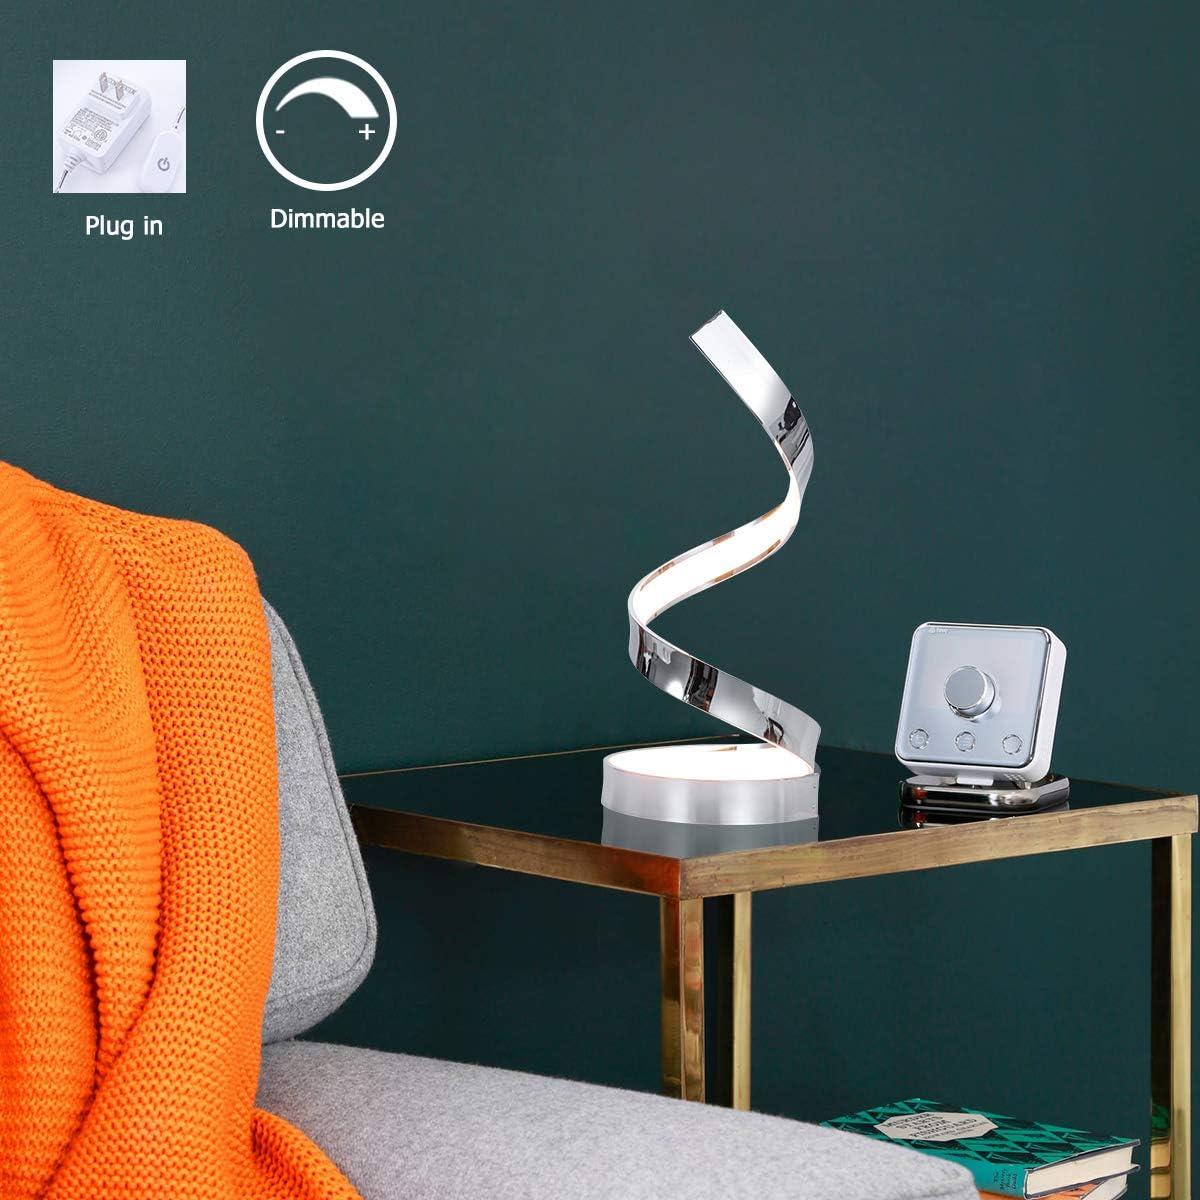 Modern LED Table Lamp Spiral Ring Dimmable Desk Lamp Plug-in Table Light Chrome Finished Warm White 3000K Desk Light for Bedroom Office Living Room, by HL